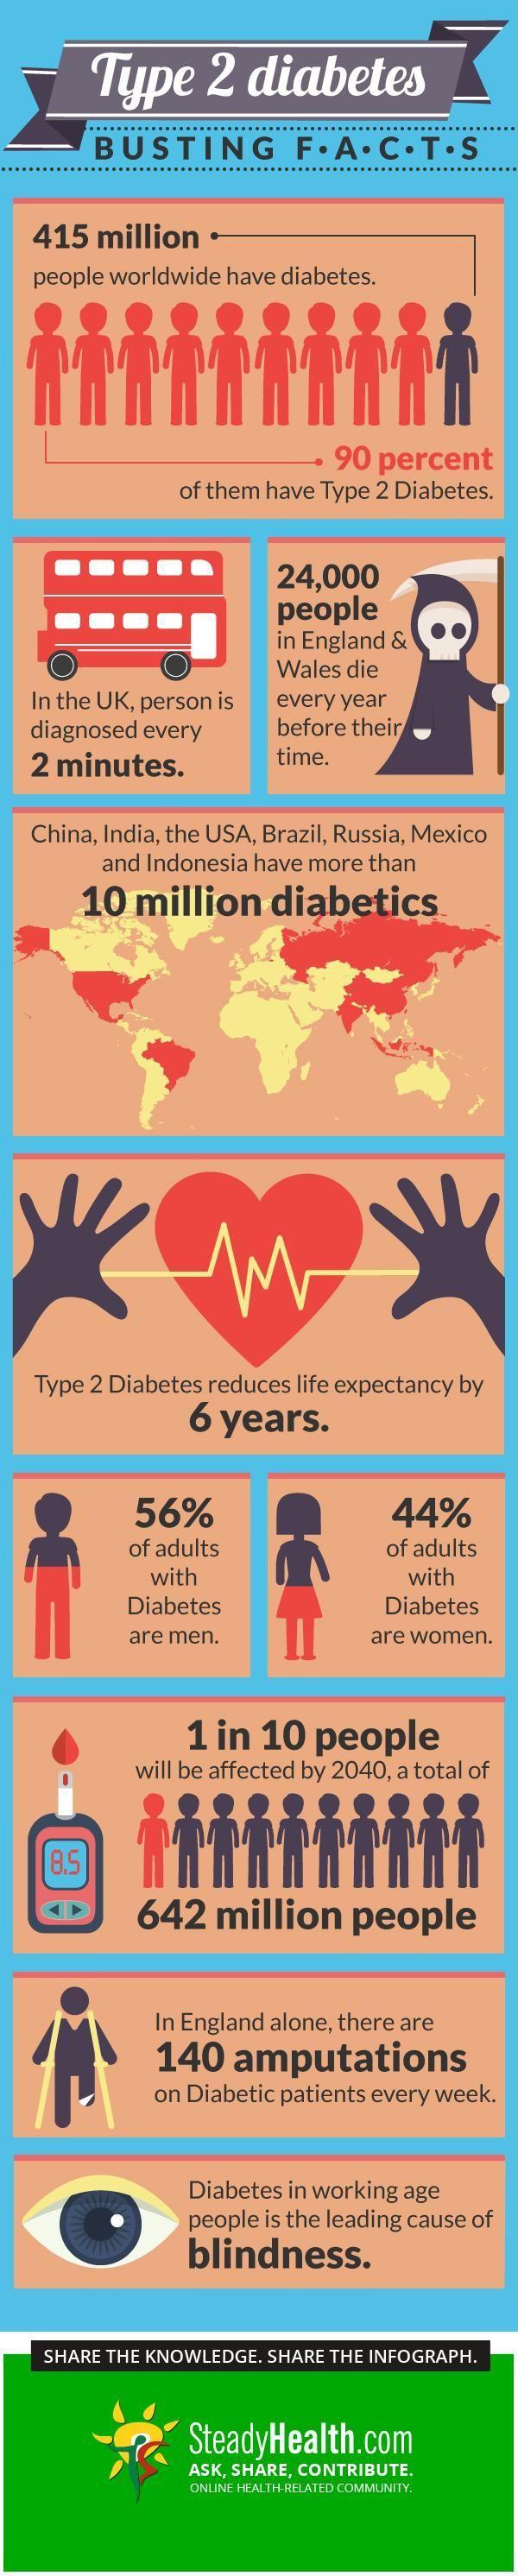 Is Type 1 Diabetes Self Inflicted